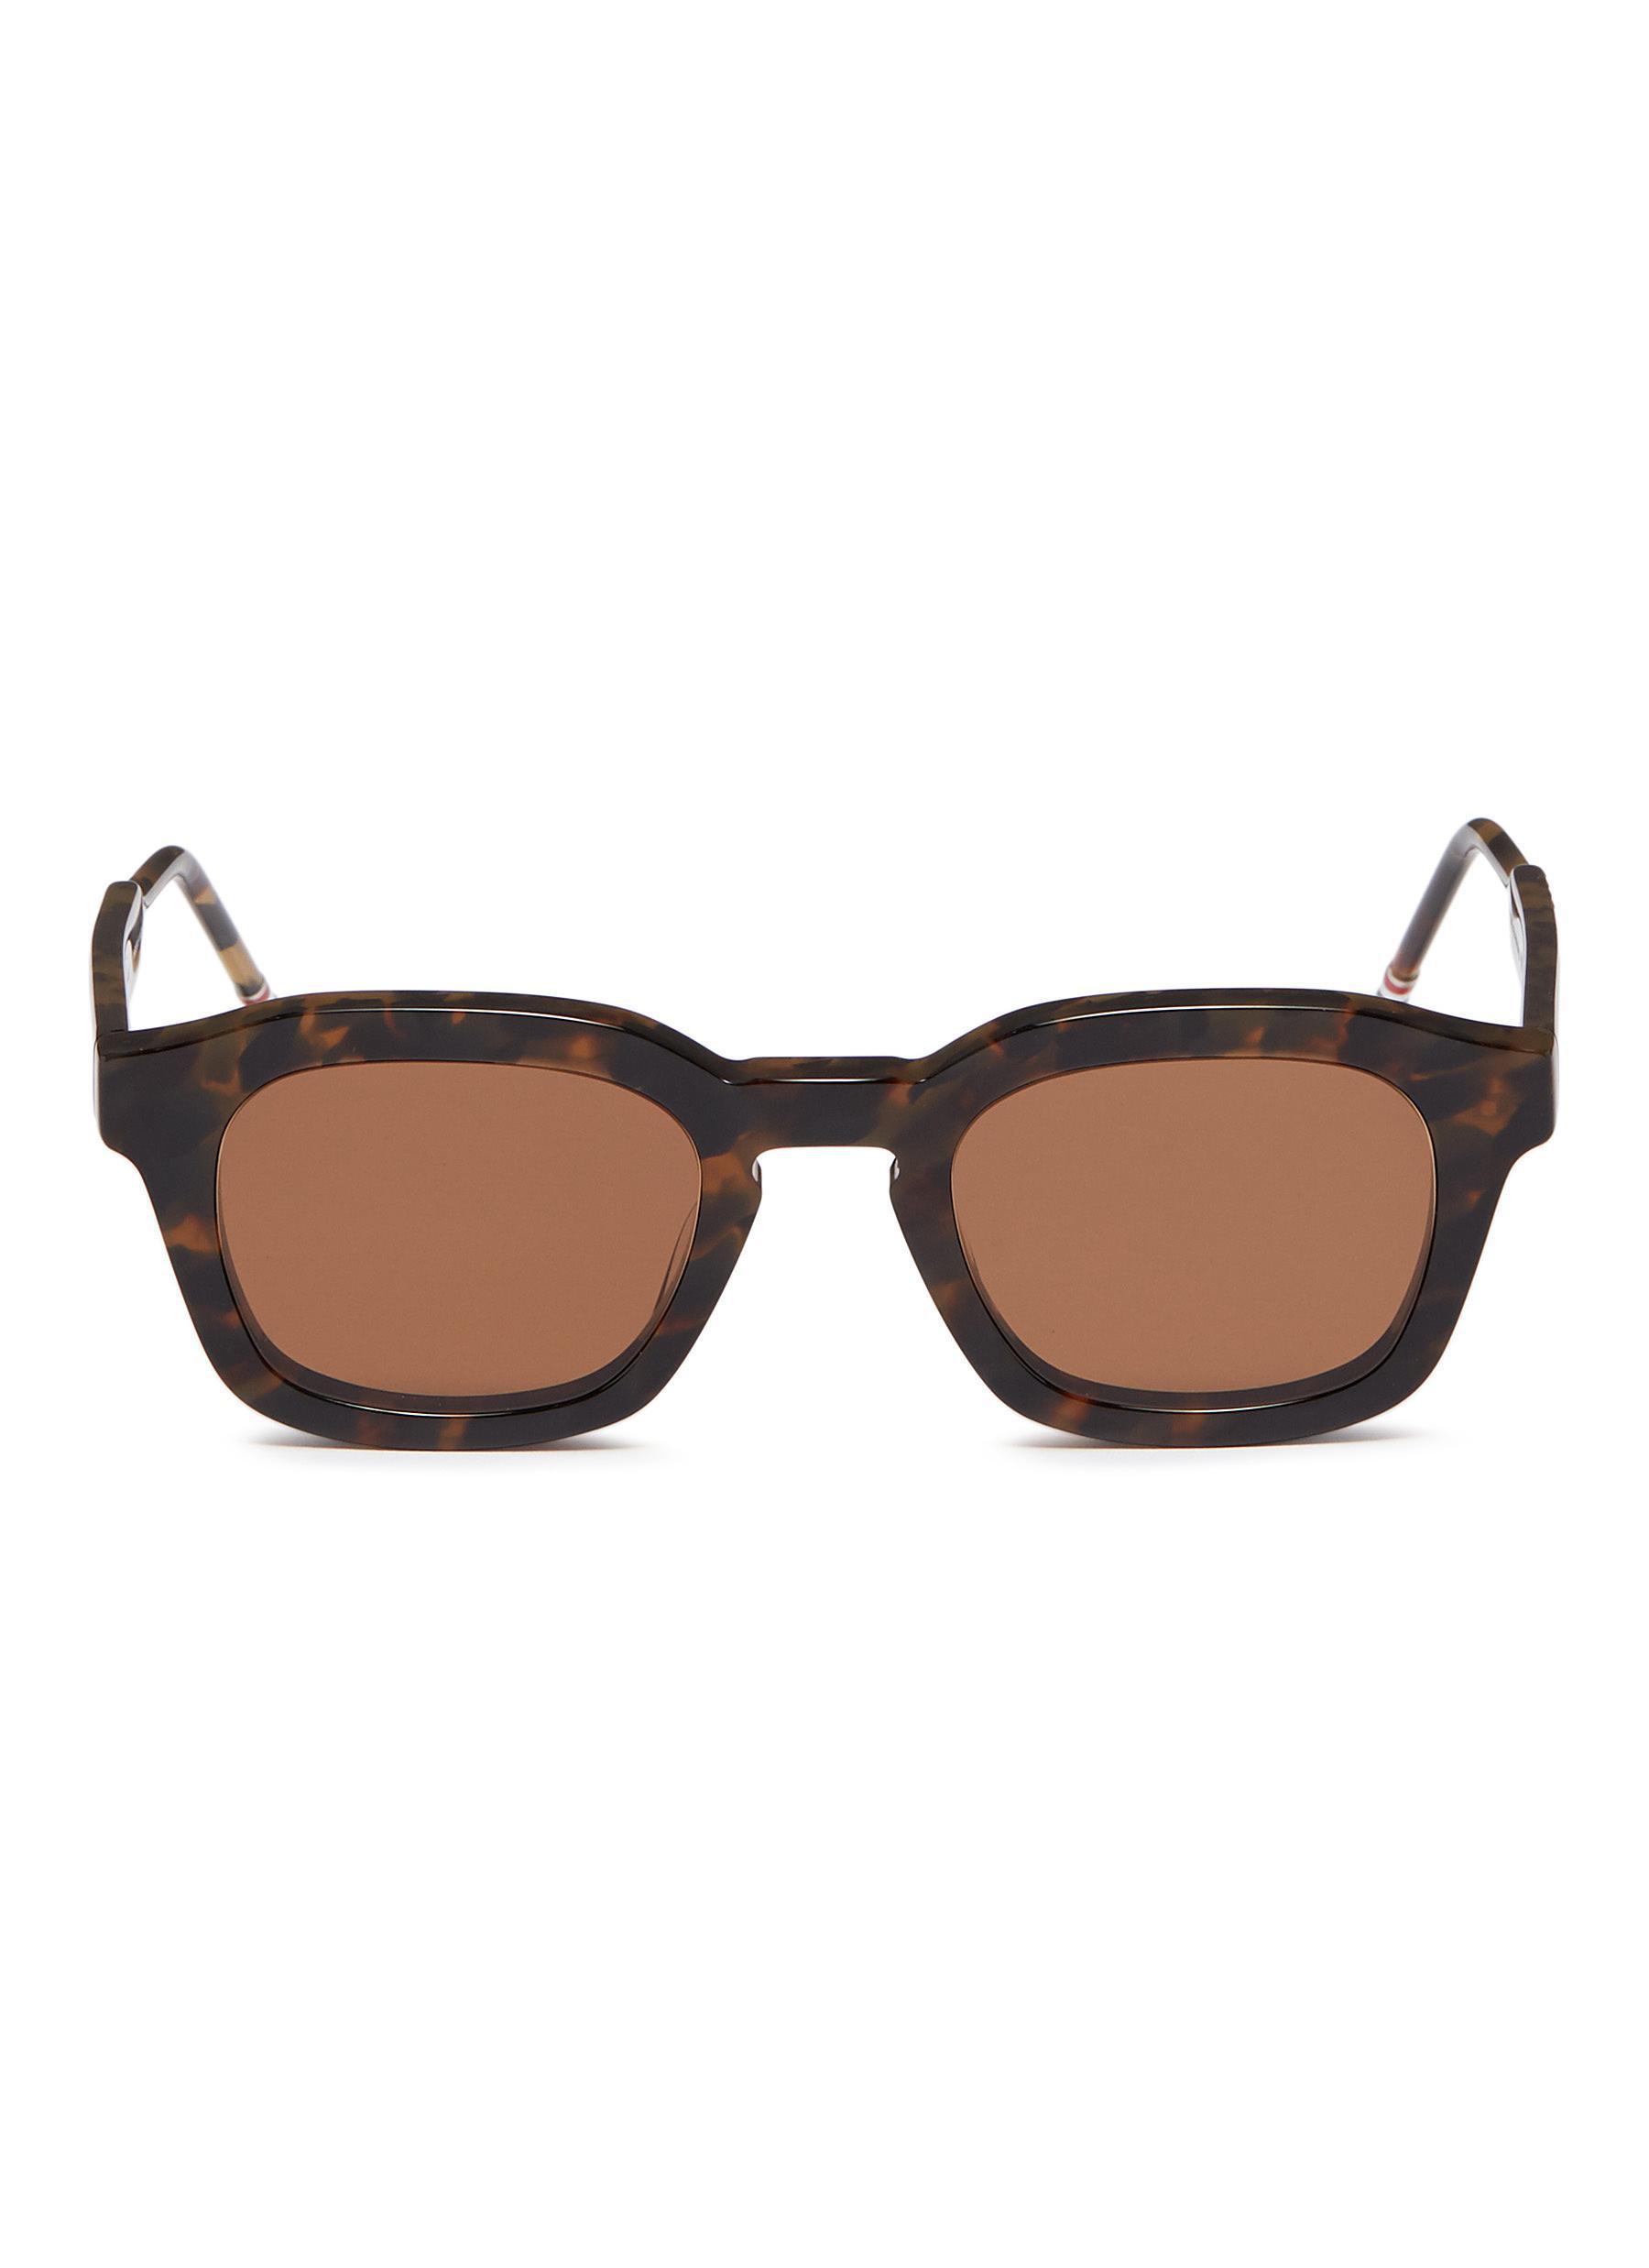 01120d6d0c5 Thom Browne. Men s Brown  tokyo  Tortoiseshell Acetate Square Sunglasses